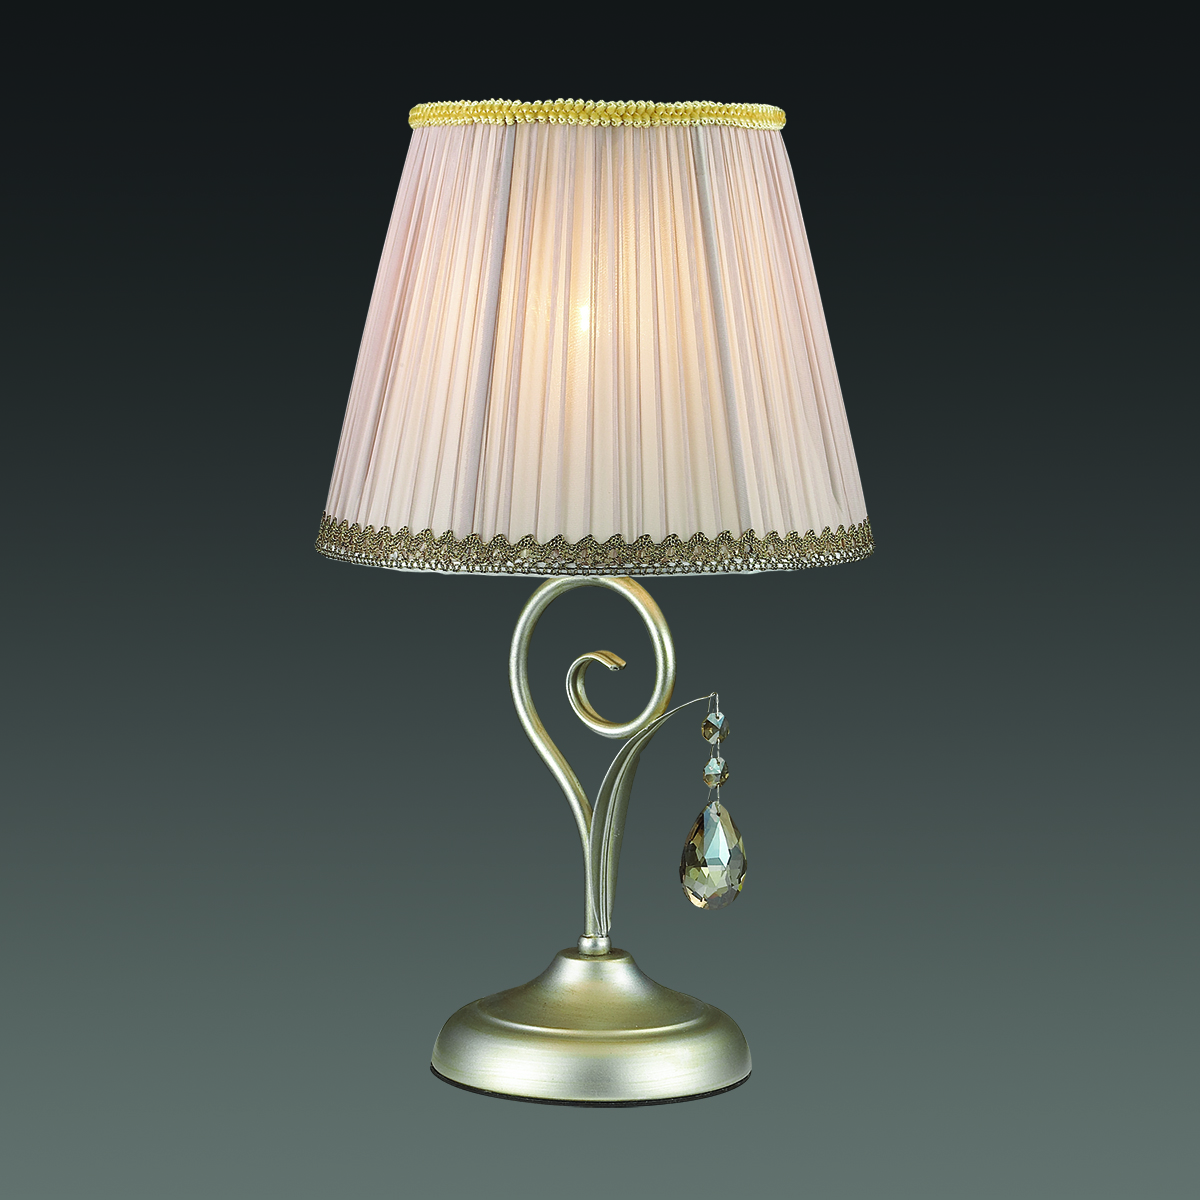 настольные лампы с двухцветным абажуром фото белые